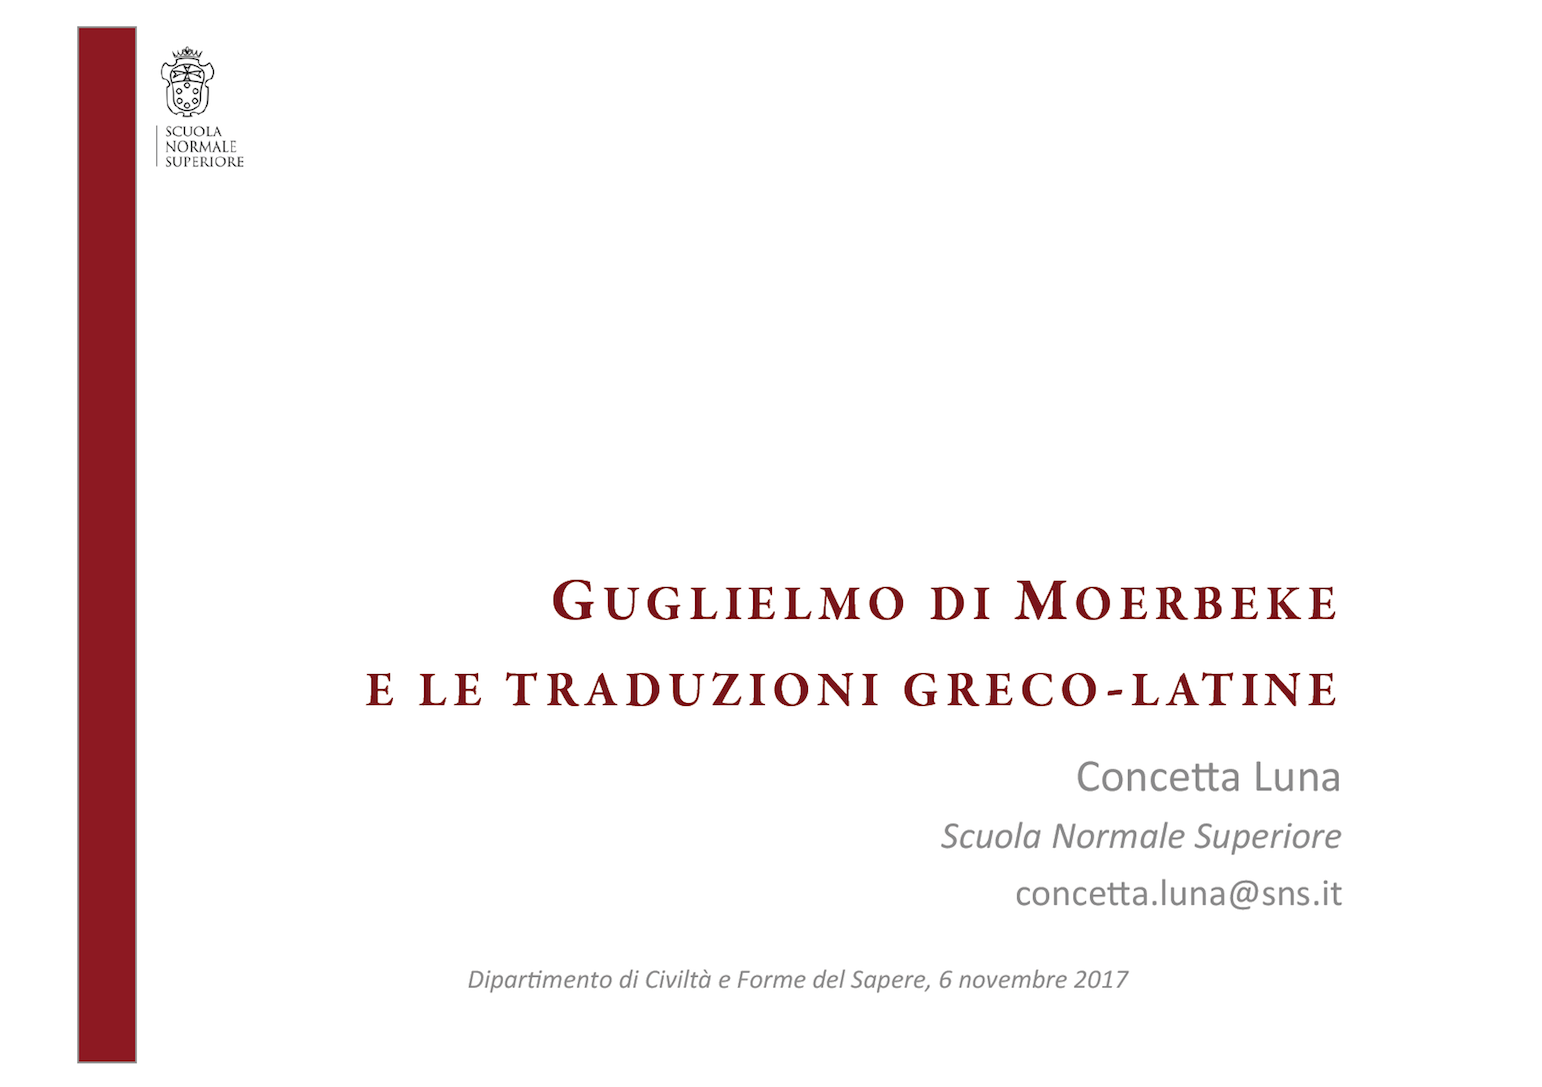 A lecture by Concetta Luna